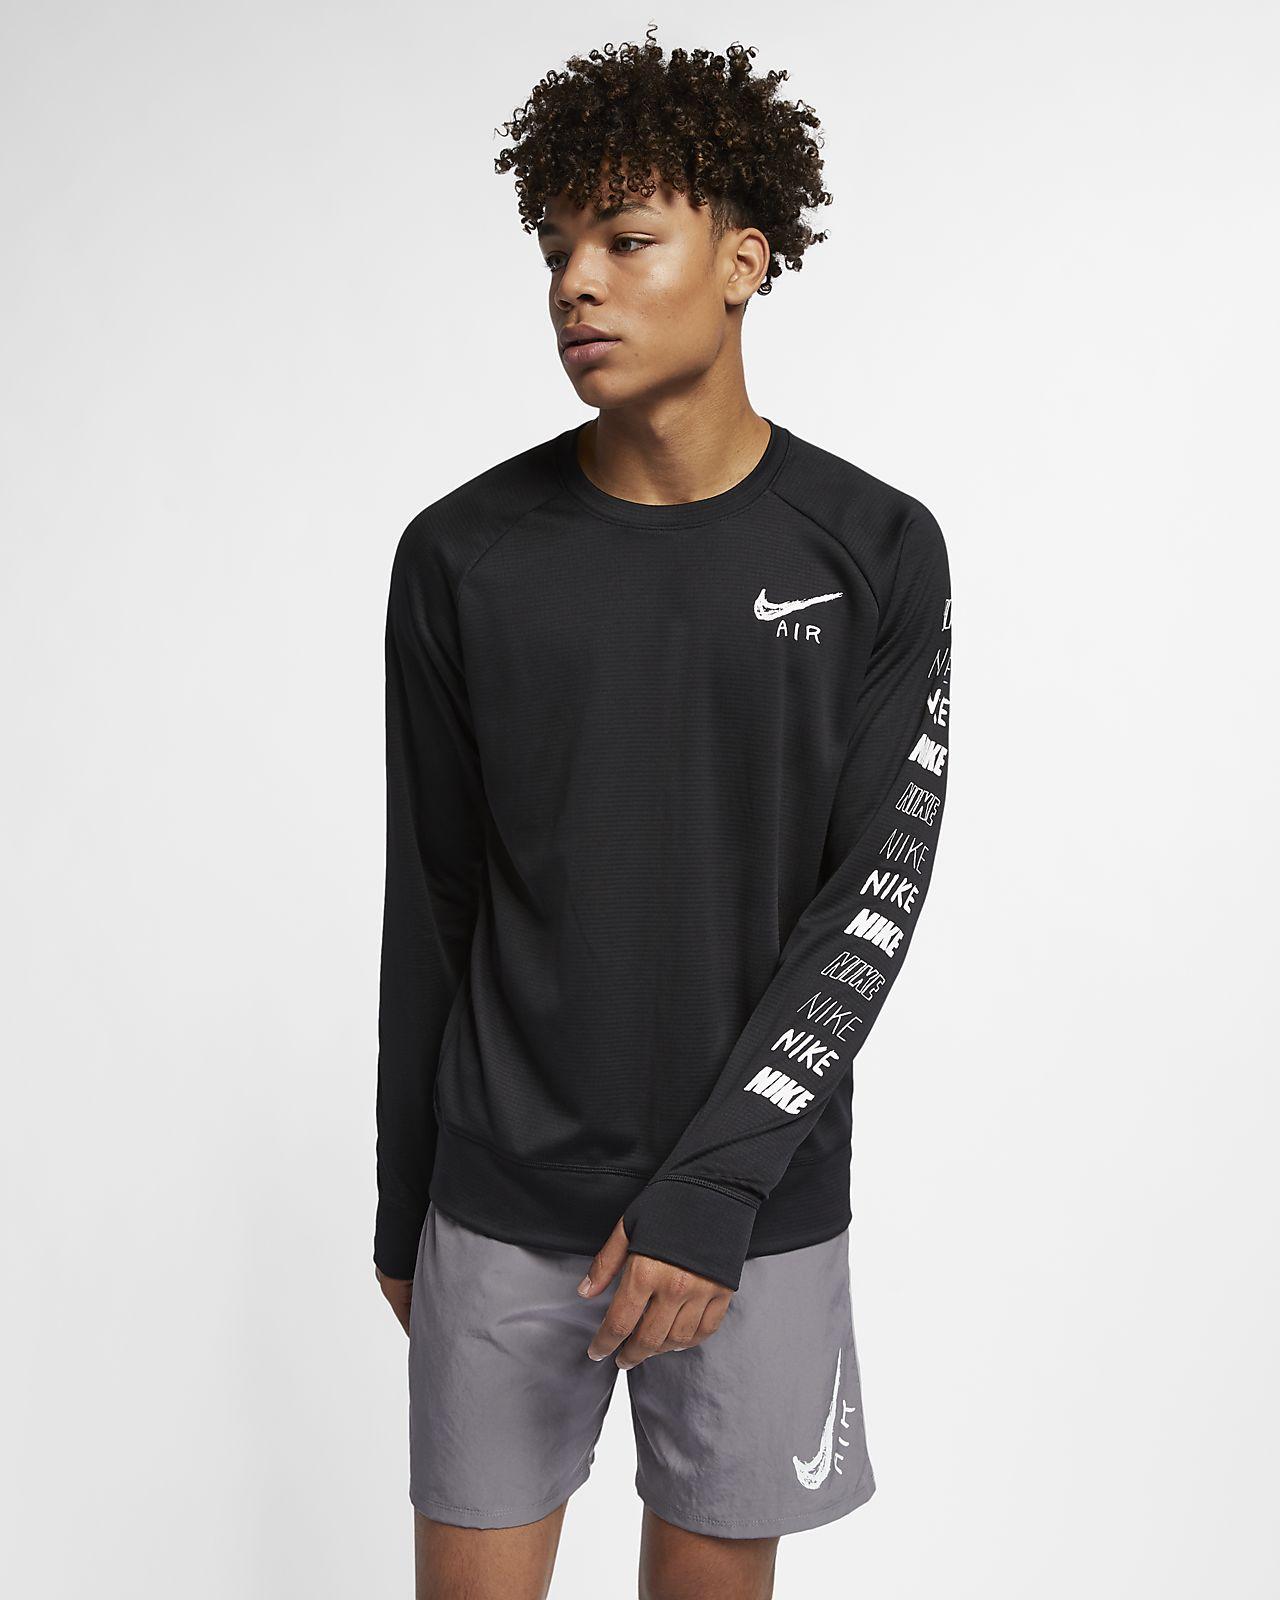 Haut de running Nike Pacer pour Homme